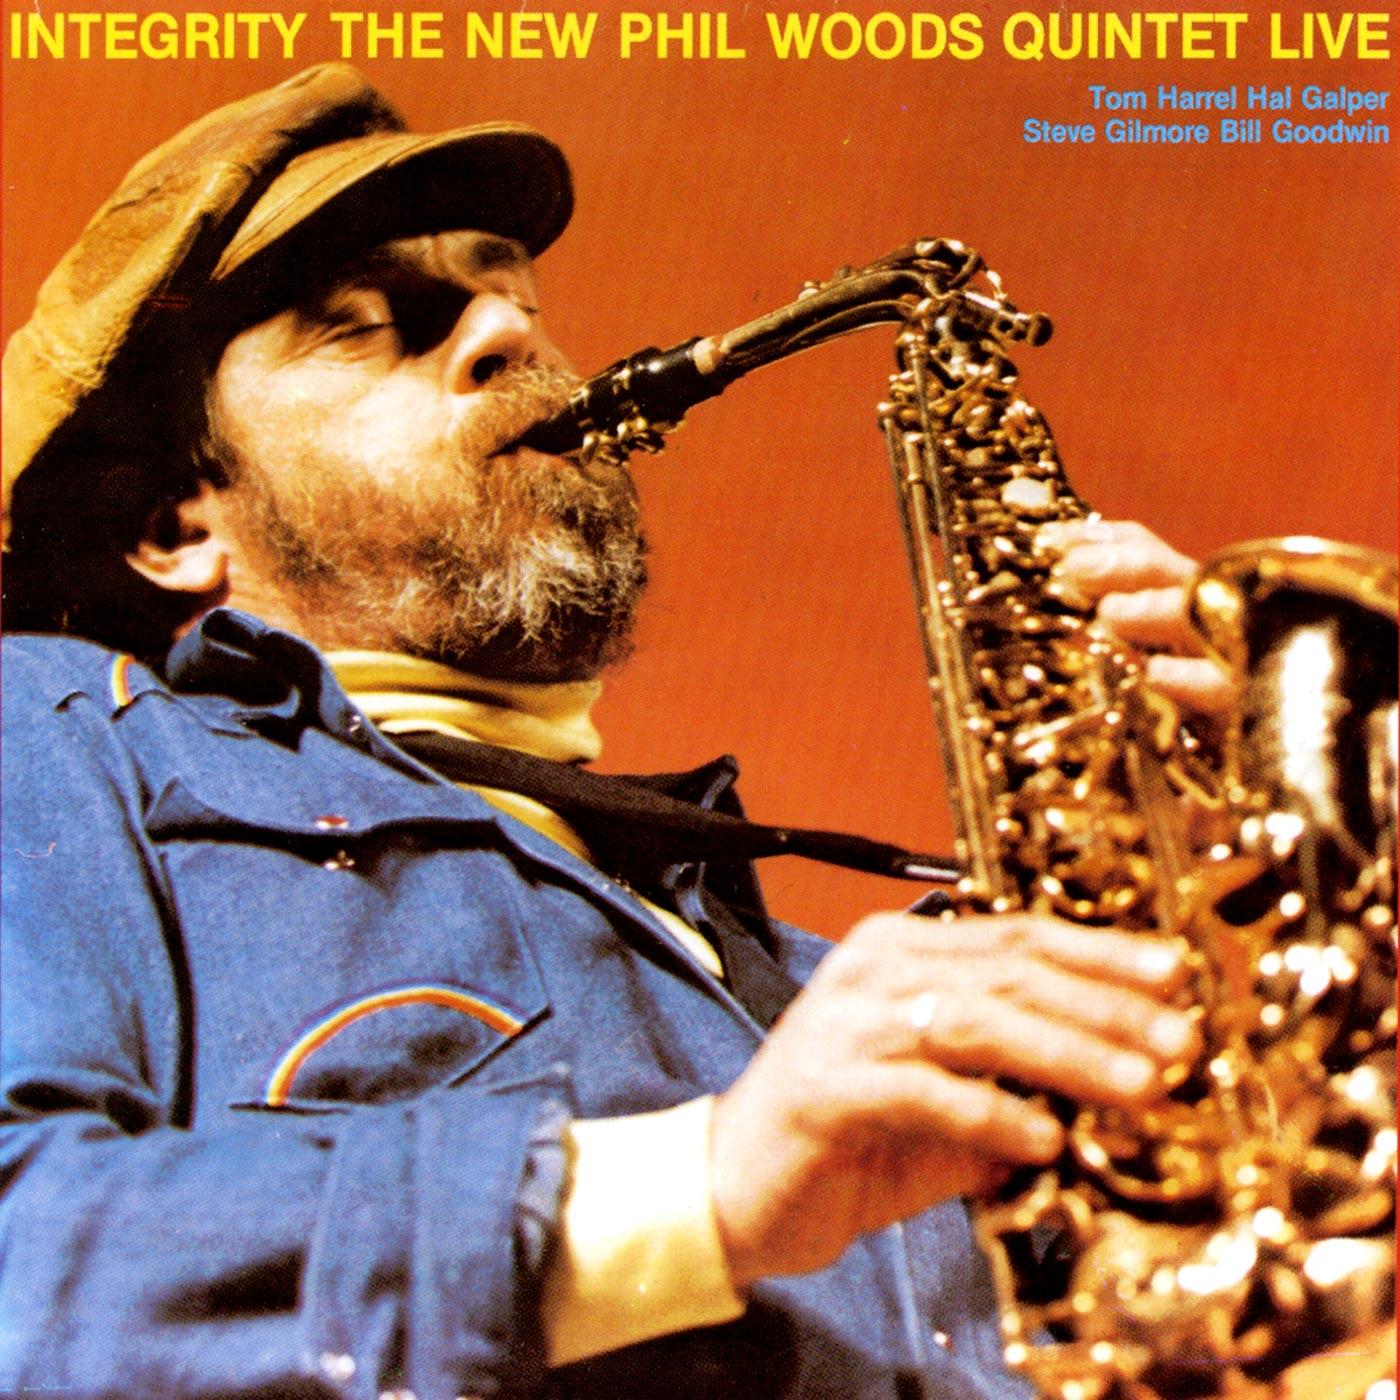 Integrity - 2Cd Set - Phil Woods Quintet